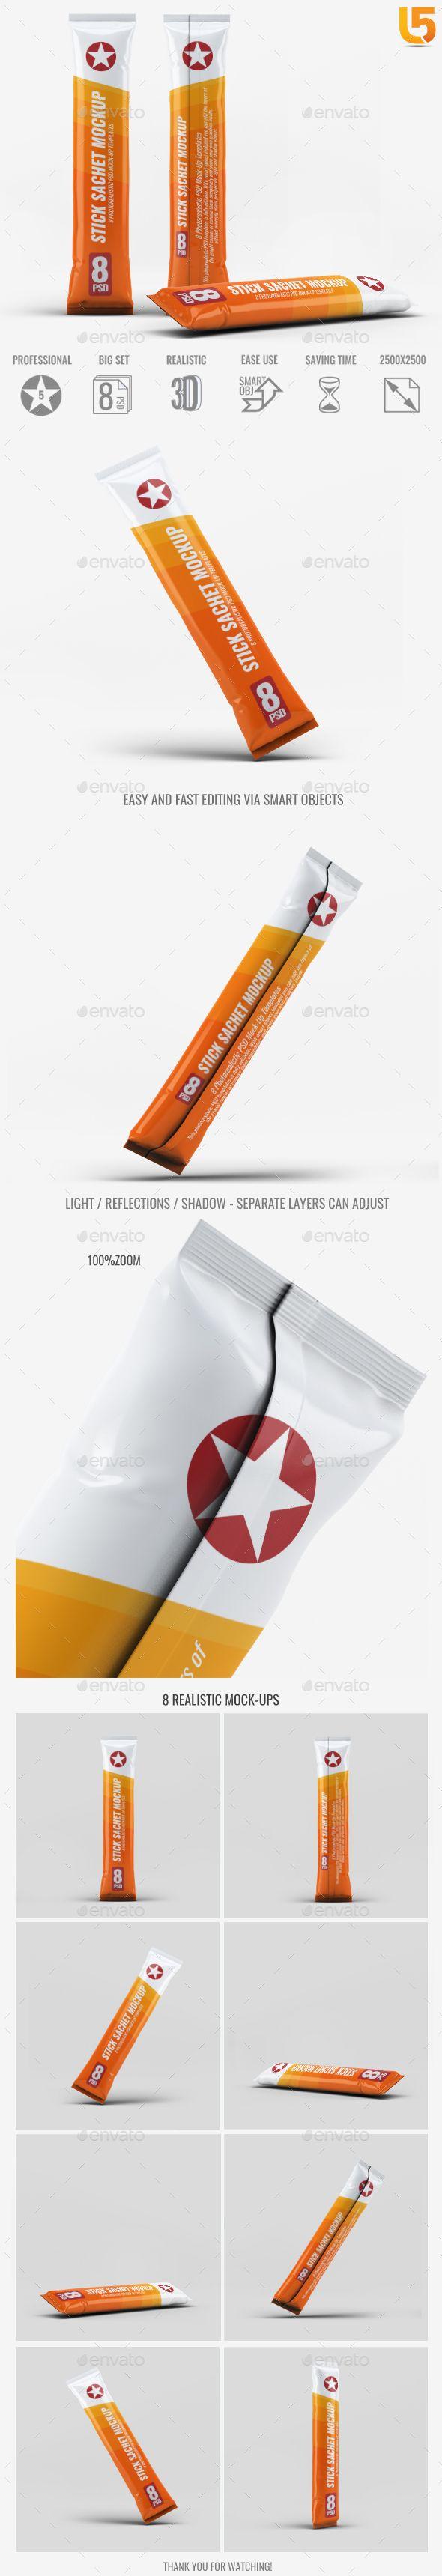 Stick Sachet MockUp — Photoshop PSD #medical #packet • Available here → https://graphicriver.net/item/stick-sachet-mockup/18701384?ref=pxcr